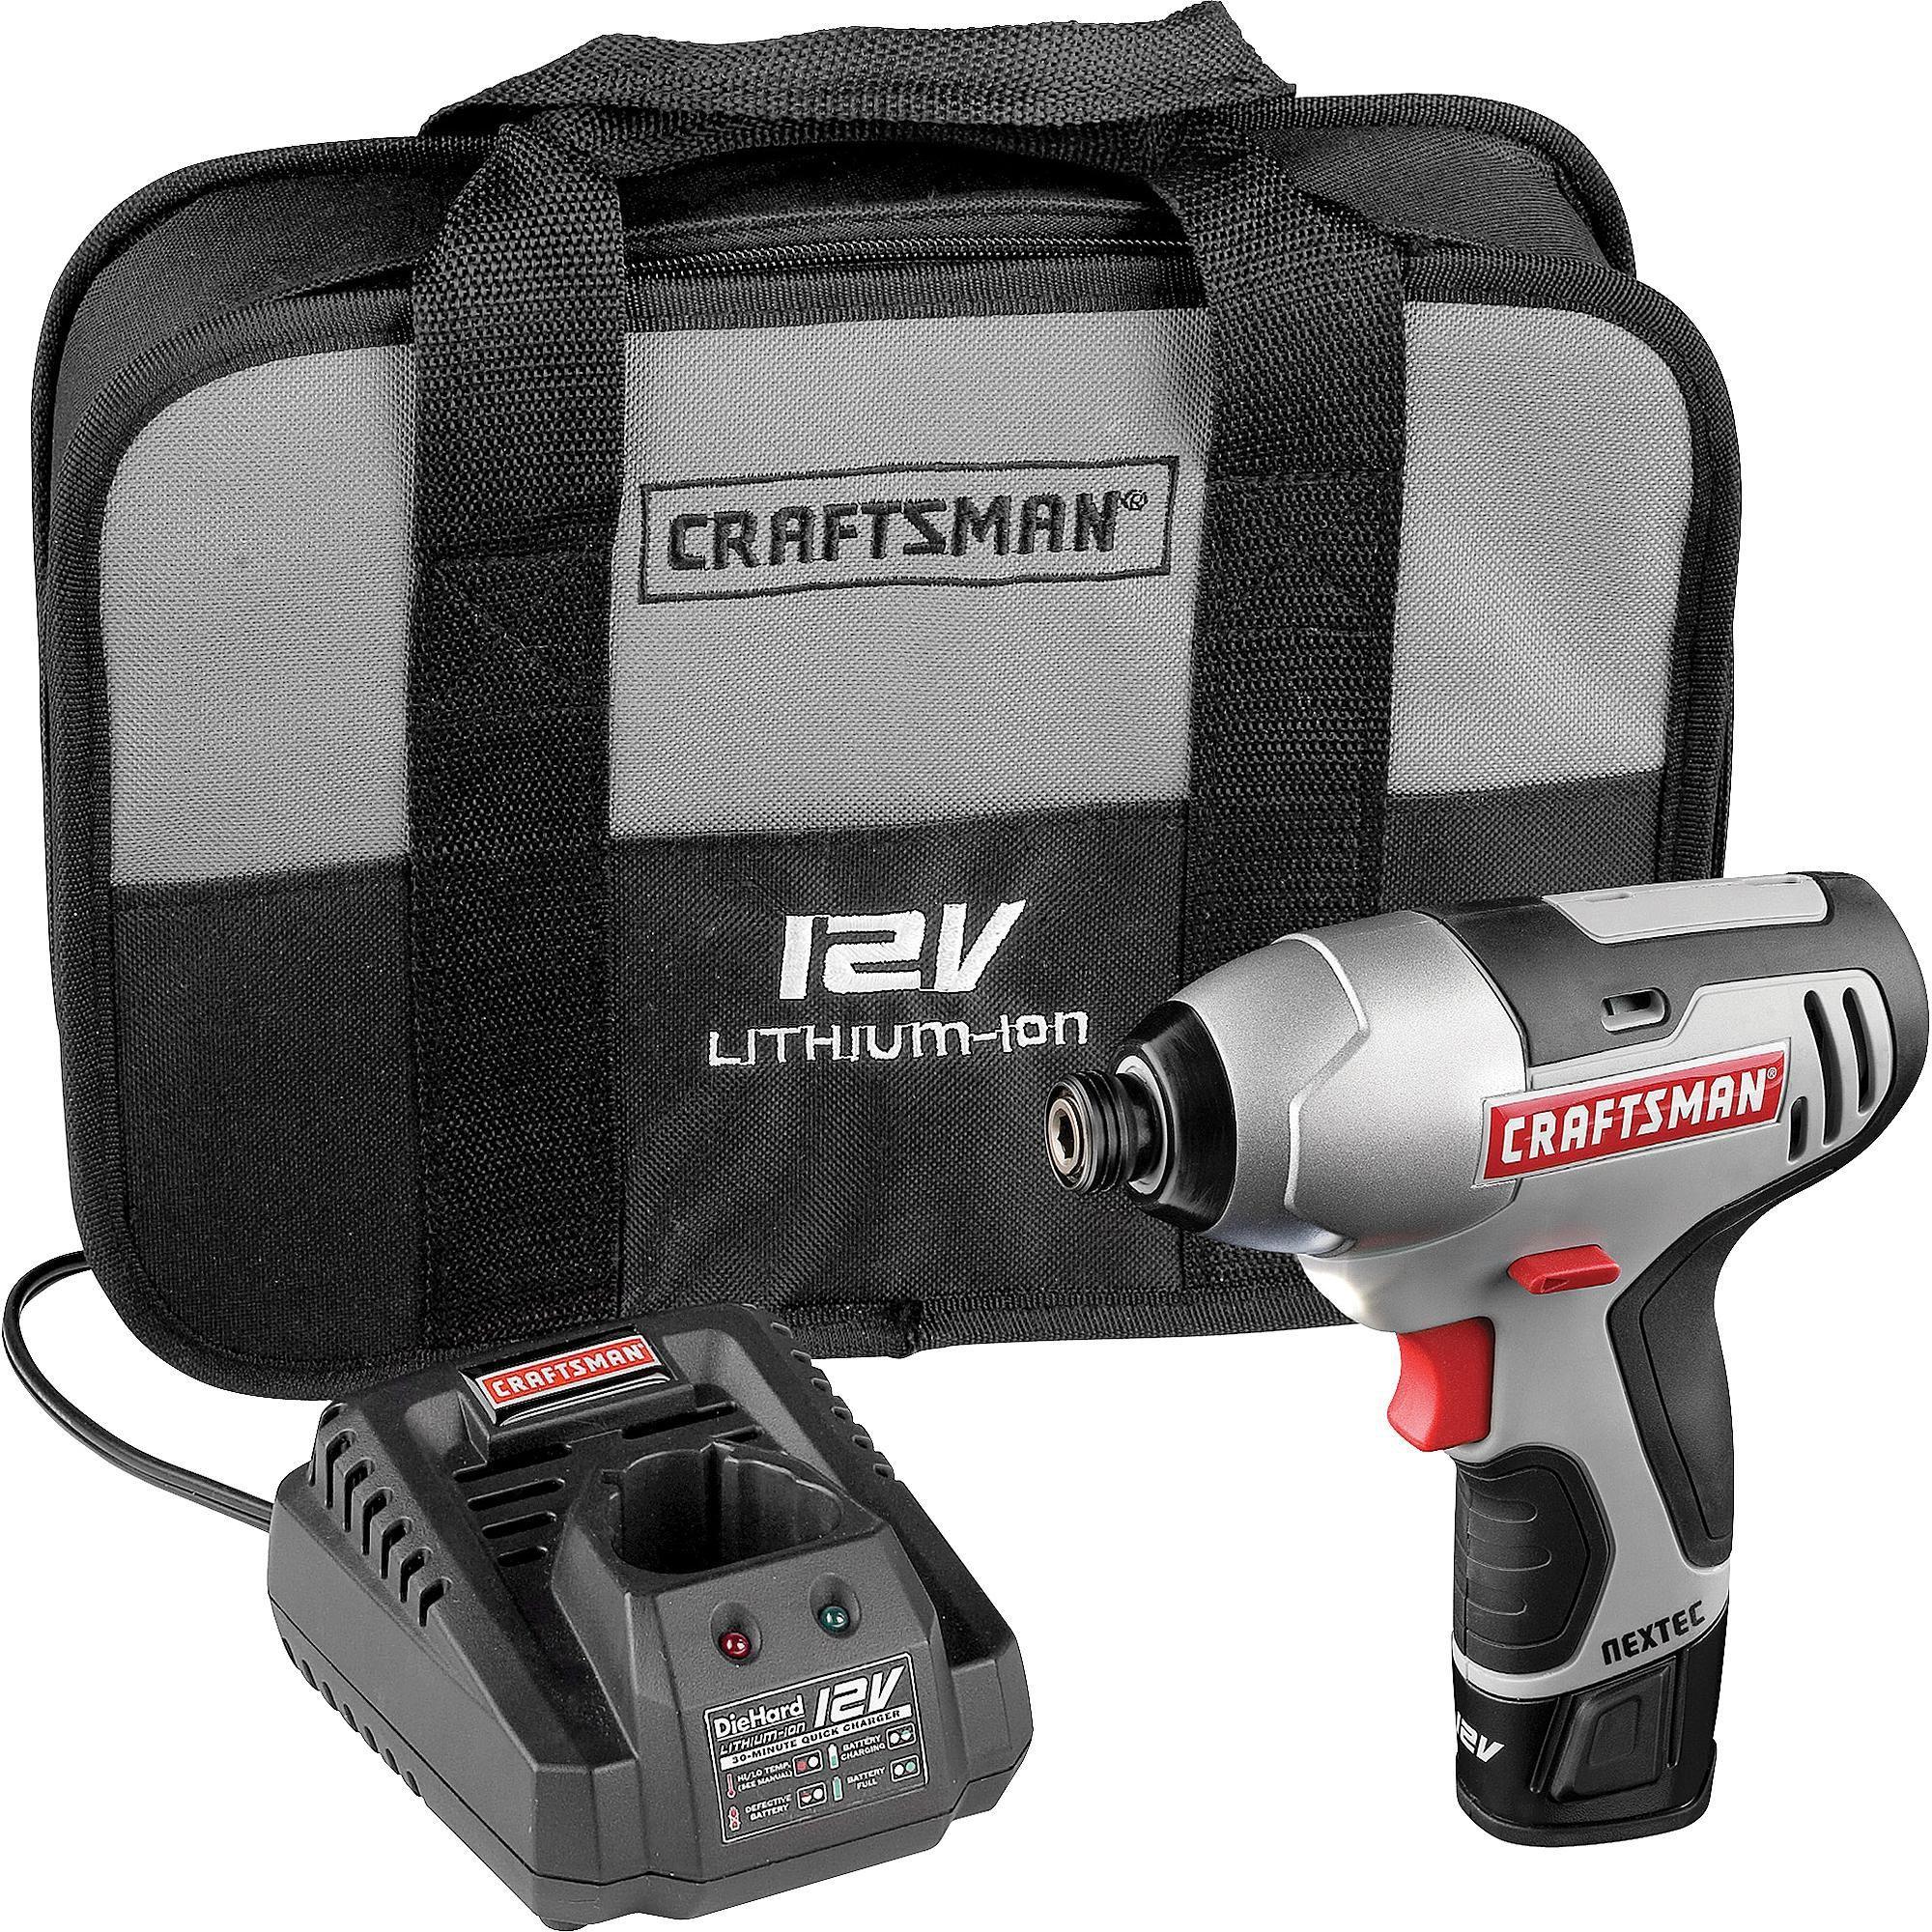 Craftsman Nextec 12v Cordless Compact 1 4 Impact Driver Gray Impact Driver Craftsman Cordless Drill